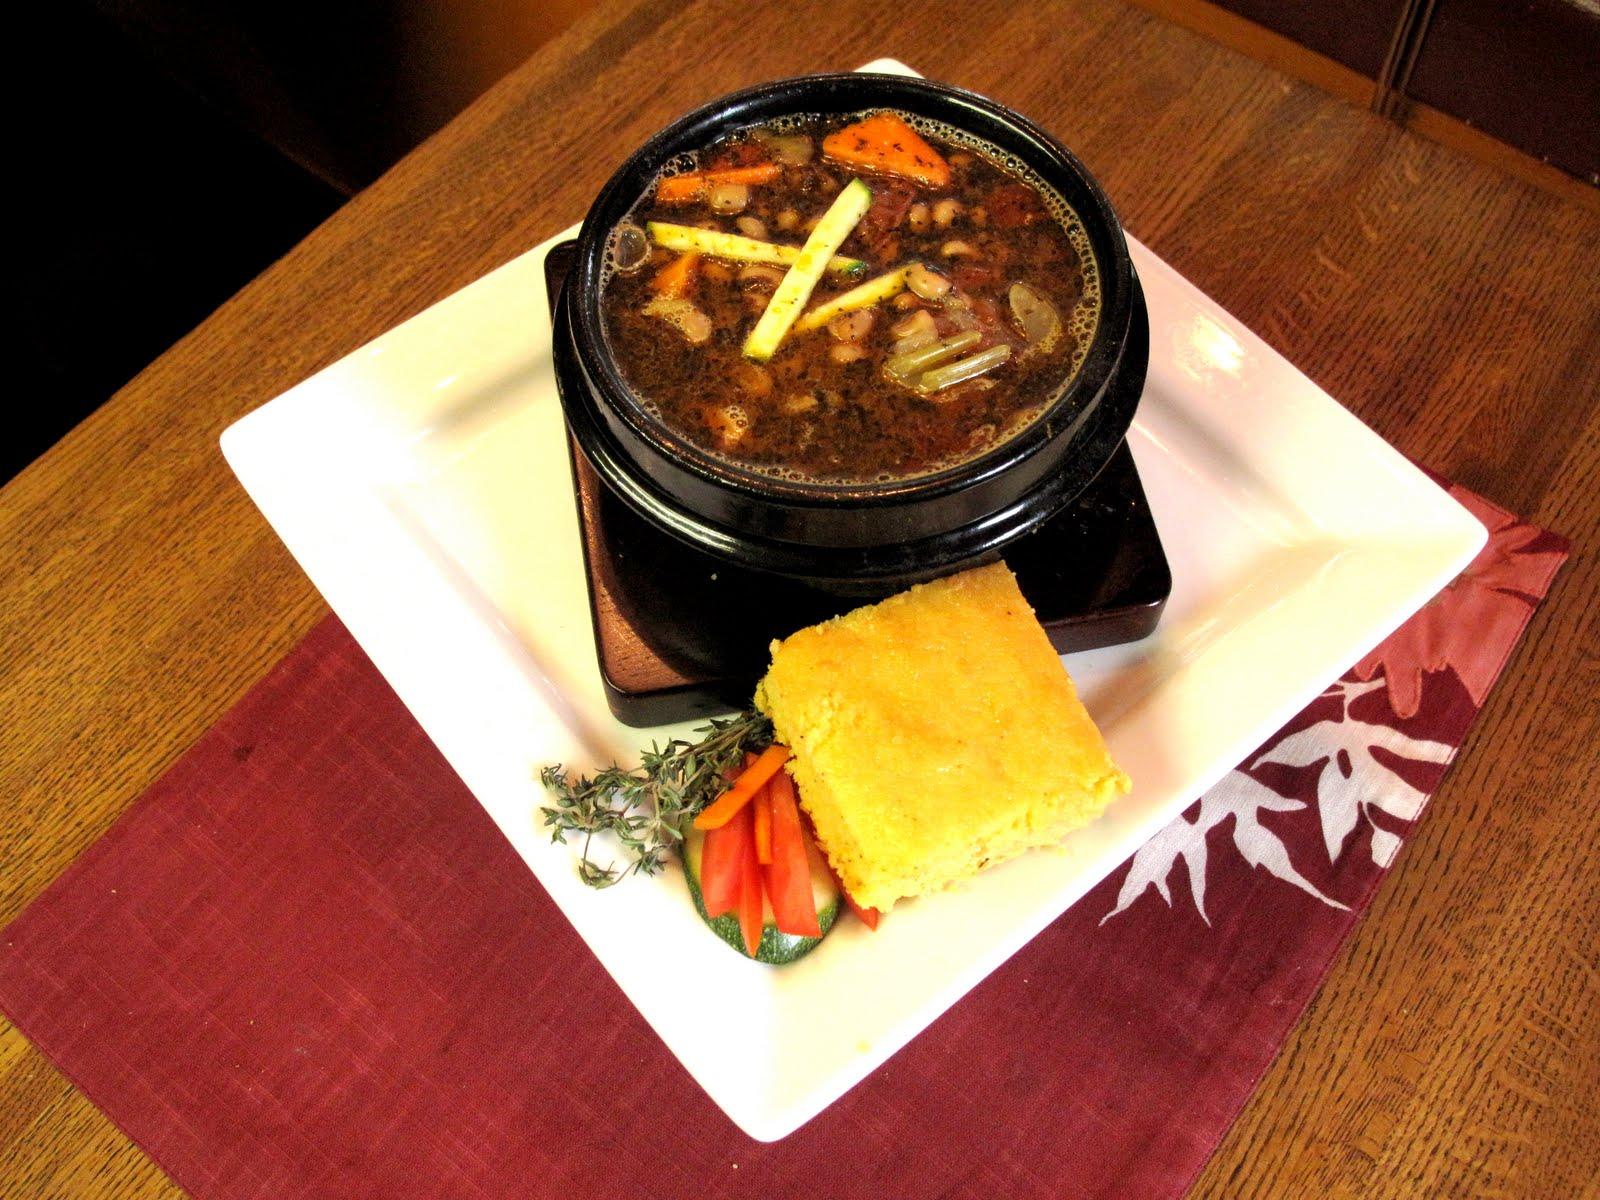 Restaurant Or Cafe Informally